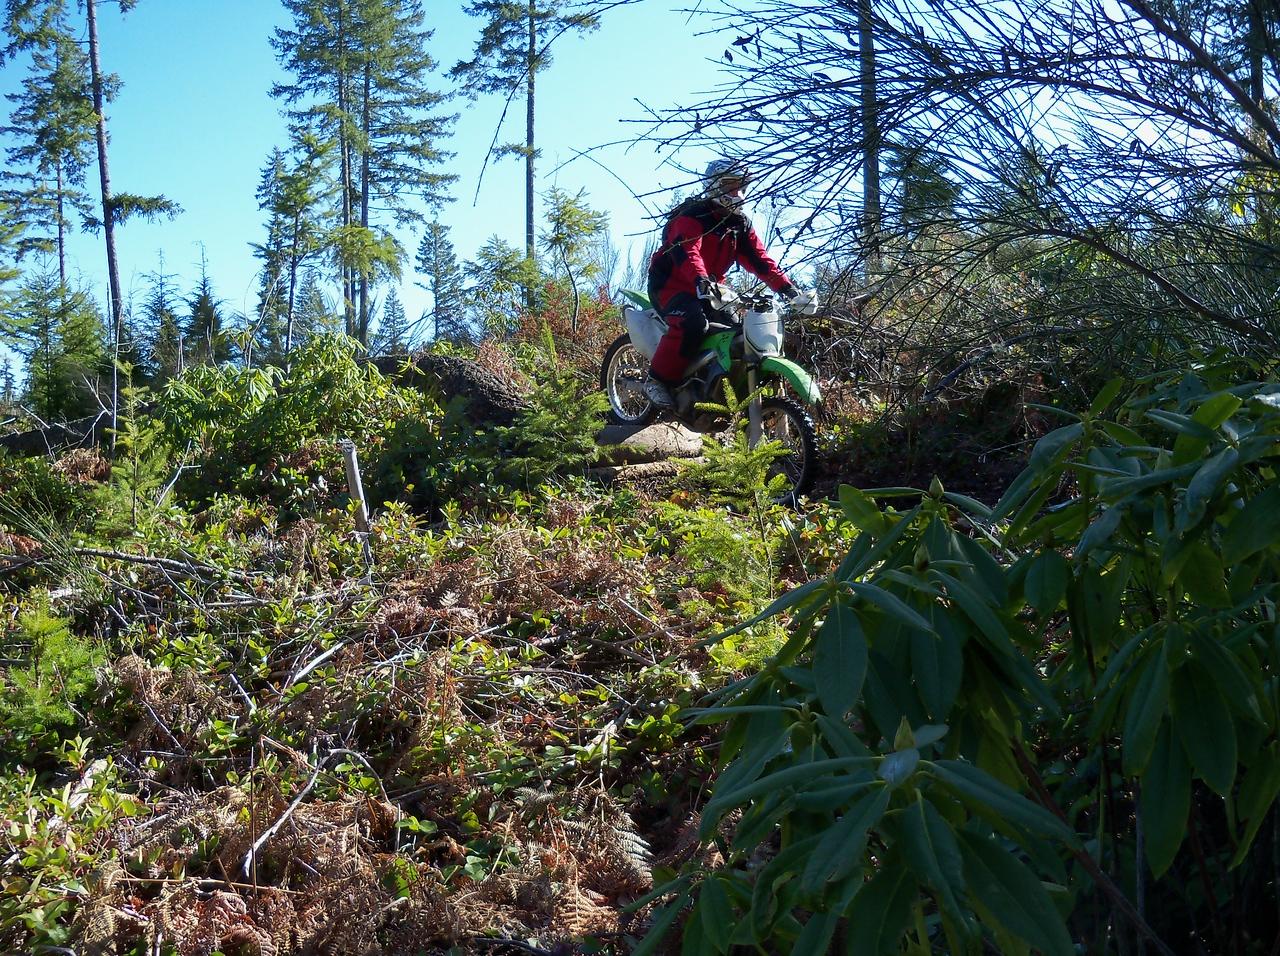 Kurt going over the log..